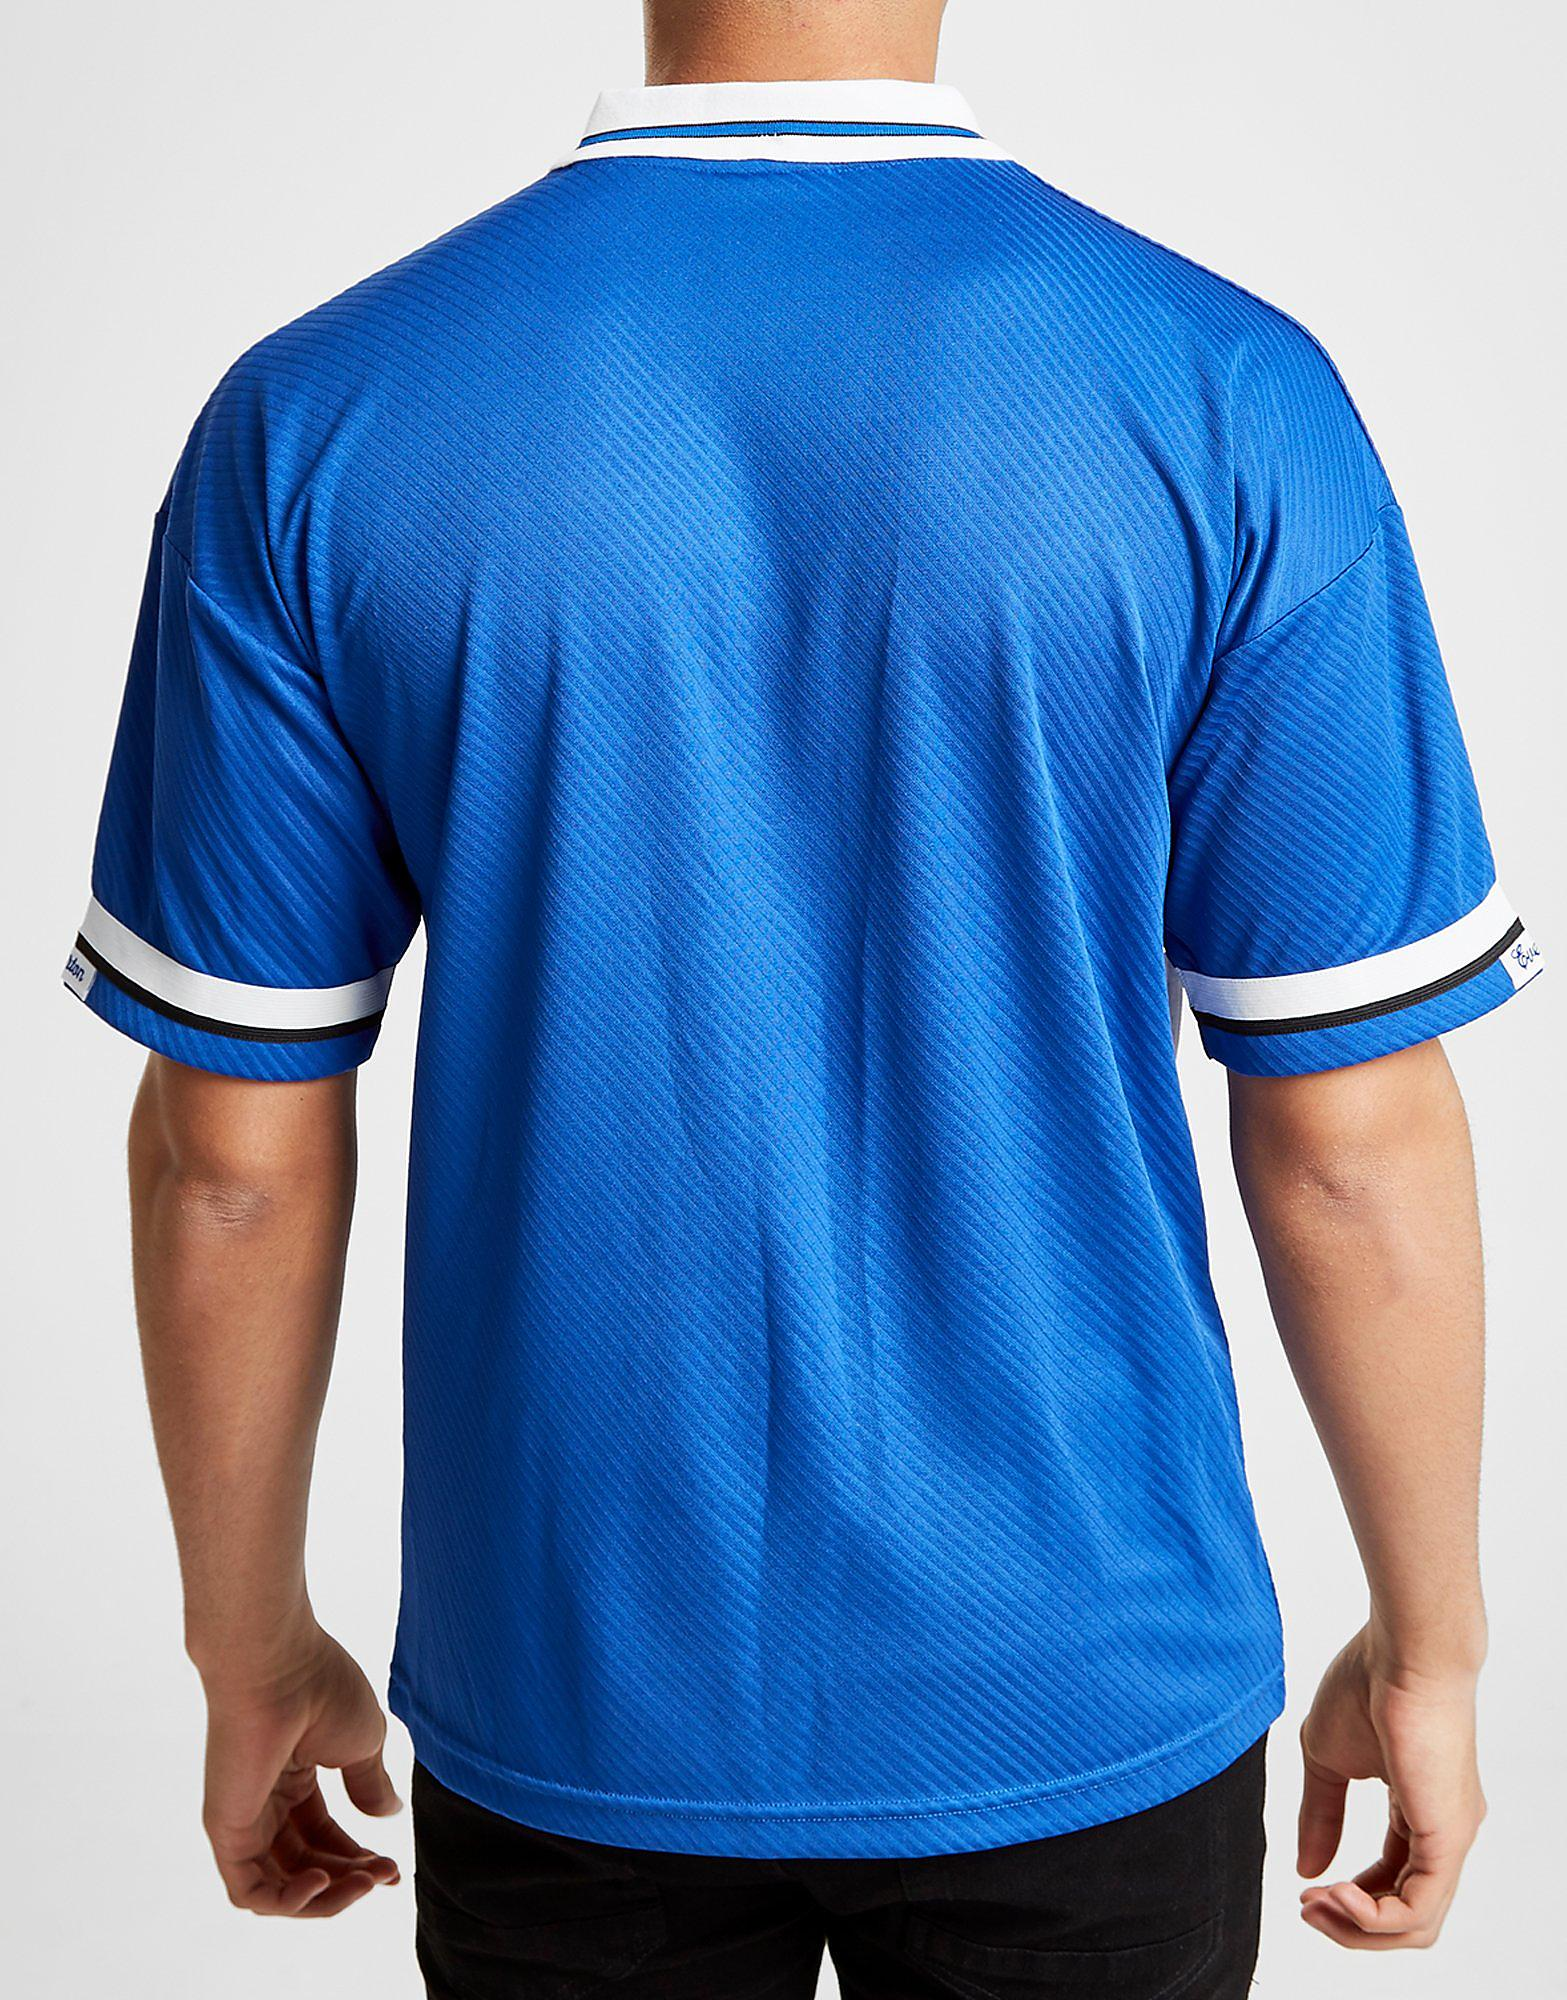 Score Draw Everton FC '94 Home Shirt